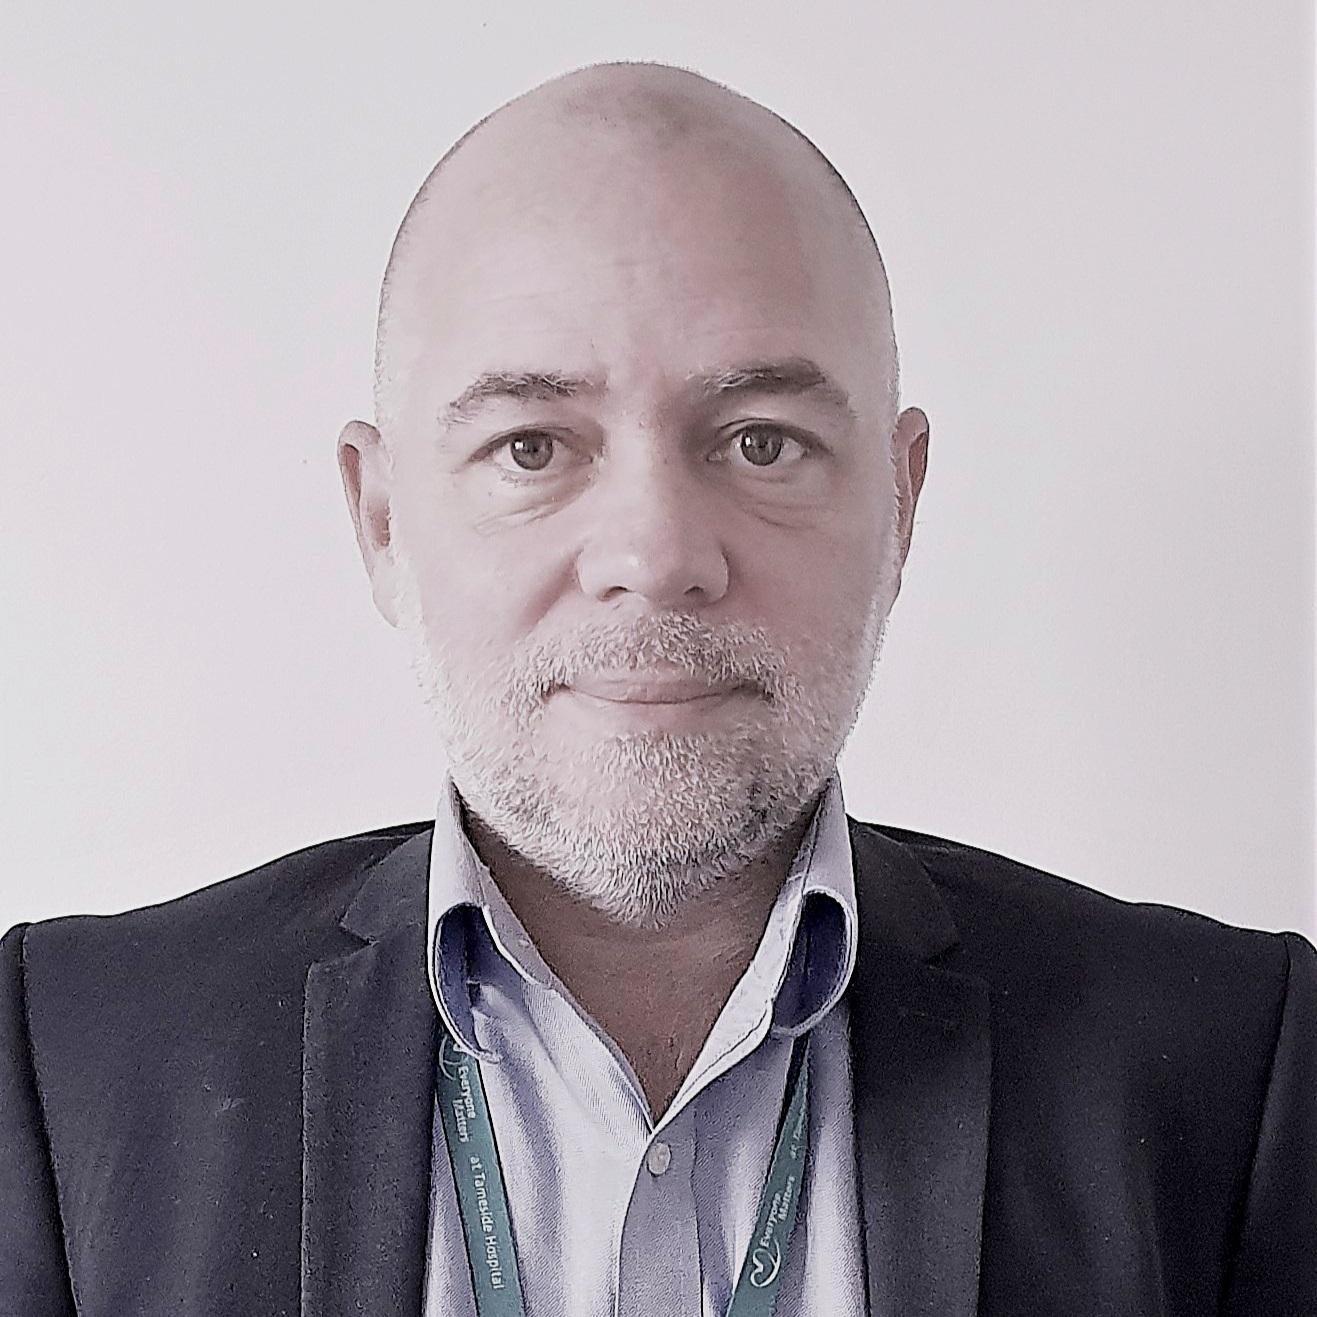 Mark+Gerrard+Head+of+Infomation+T%26G+Hosp.jpg